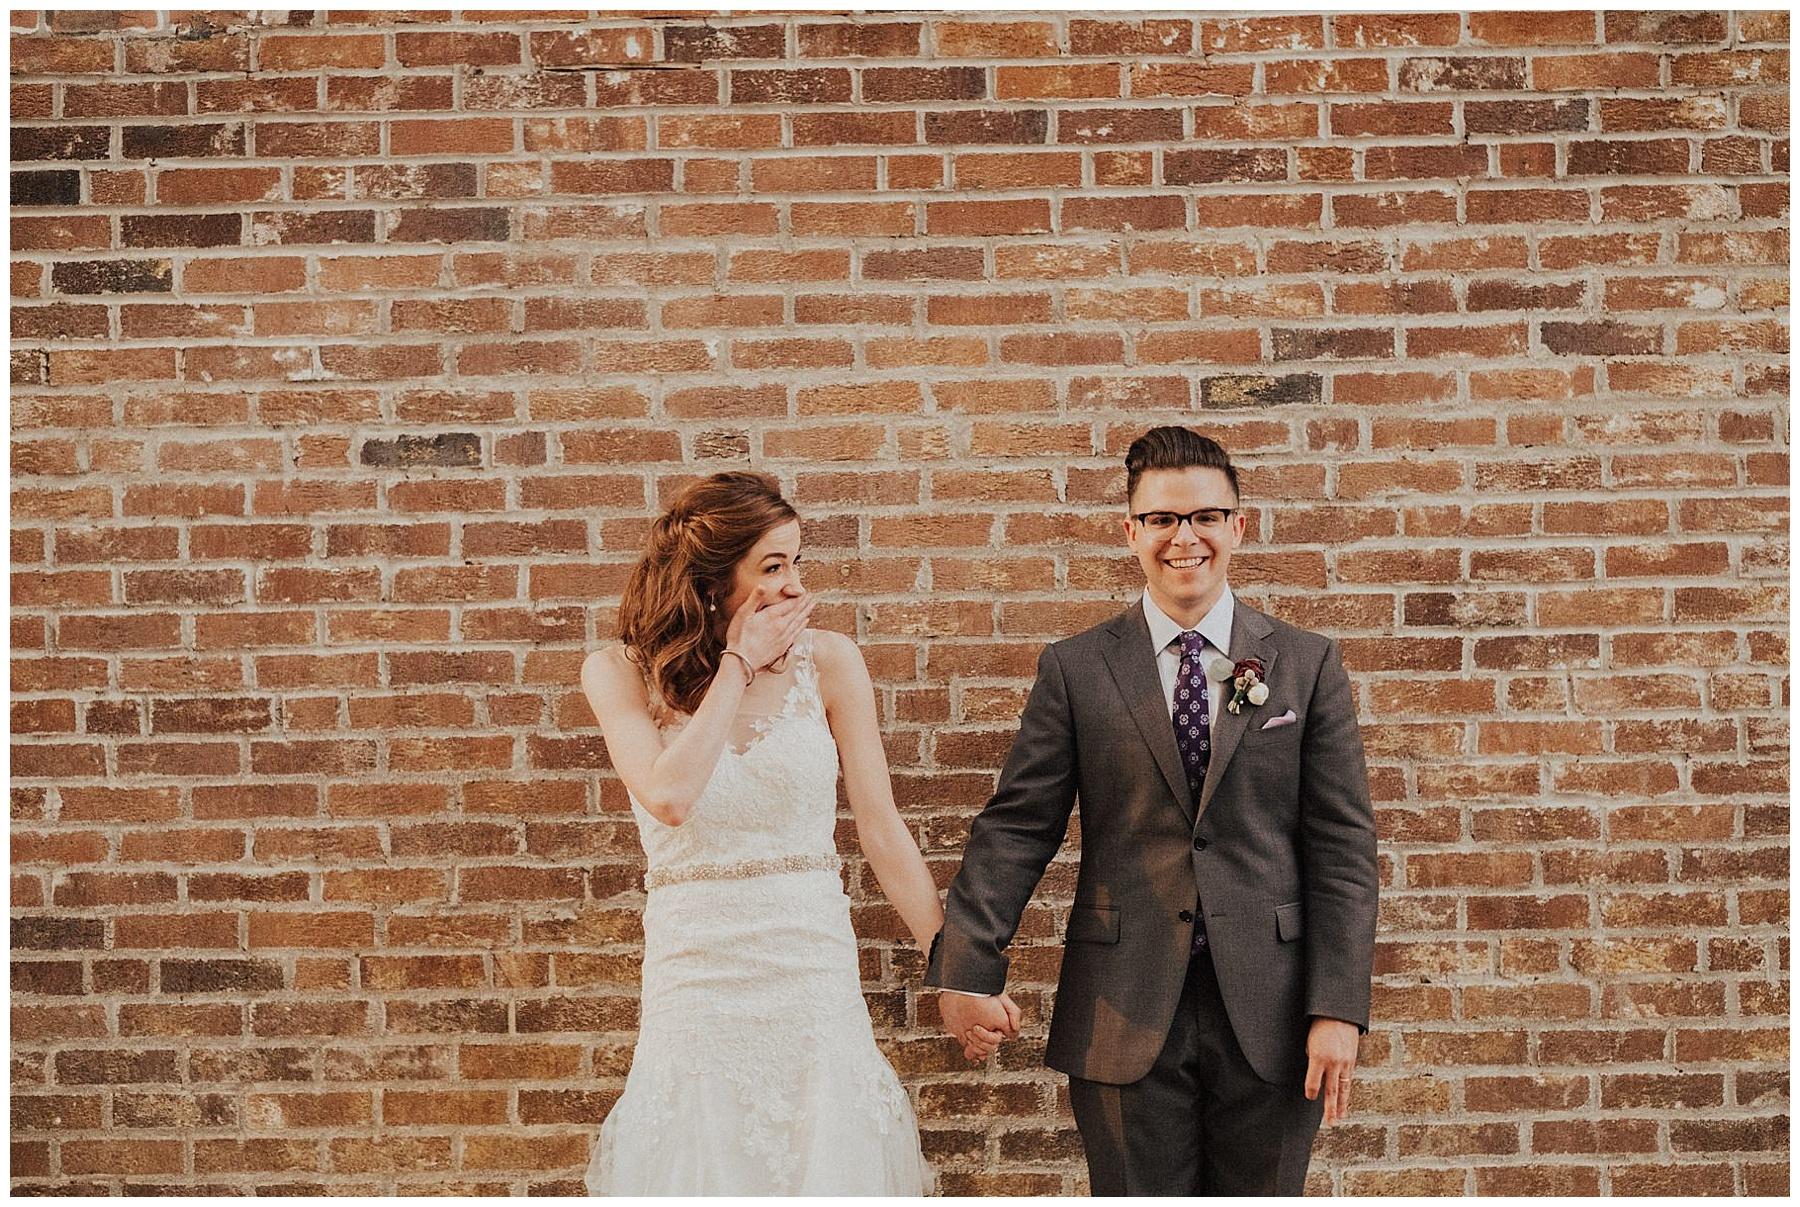 Kylie Garden Wedding Tampa Wedding Photographer-124.jpg